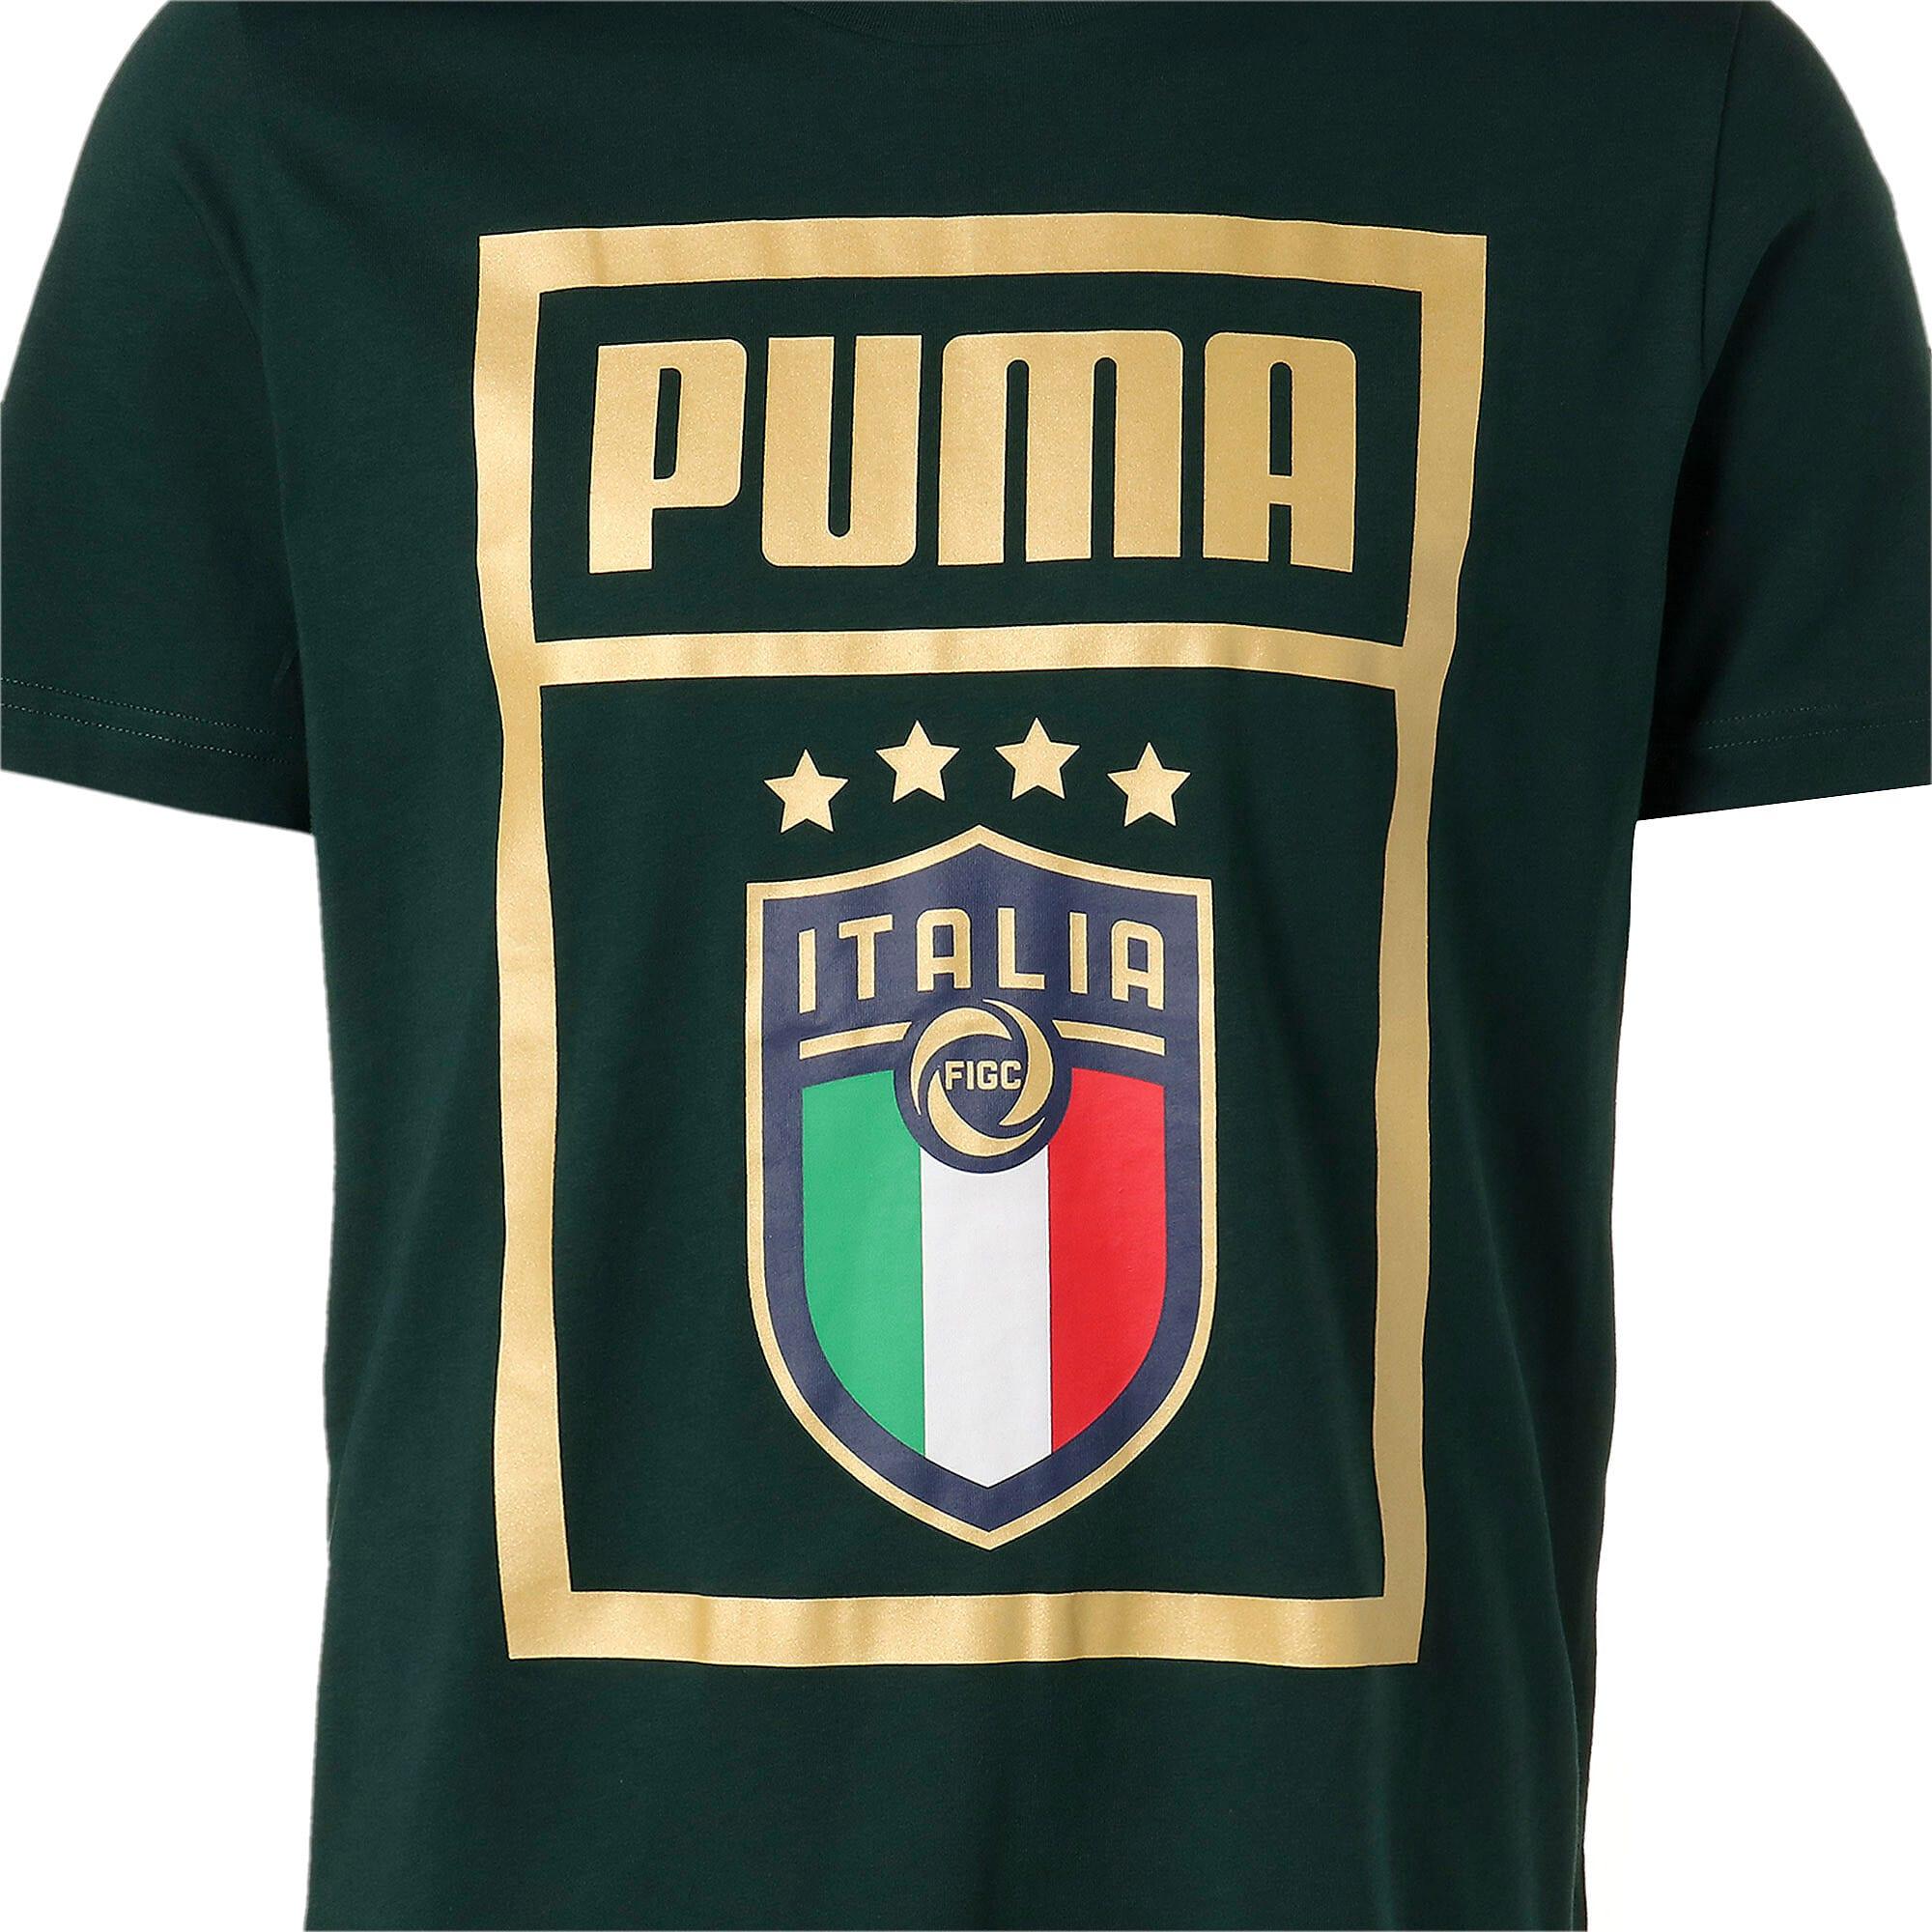 Thumbnail 7 of FIGC イタリア PUMA DNA Tシャツ 半袖, Ponderosa Pine-Team gold, medium-JPN